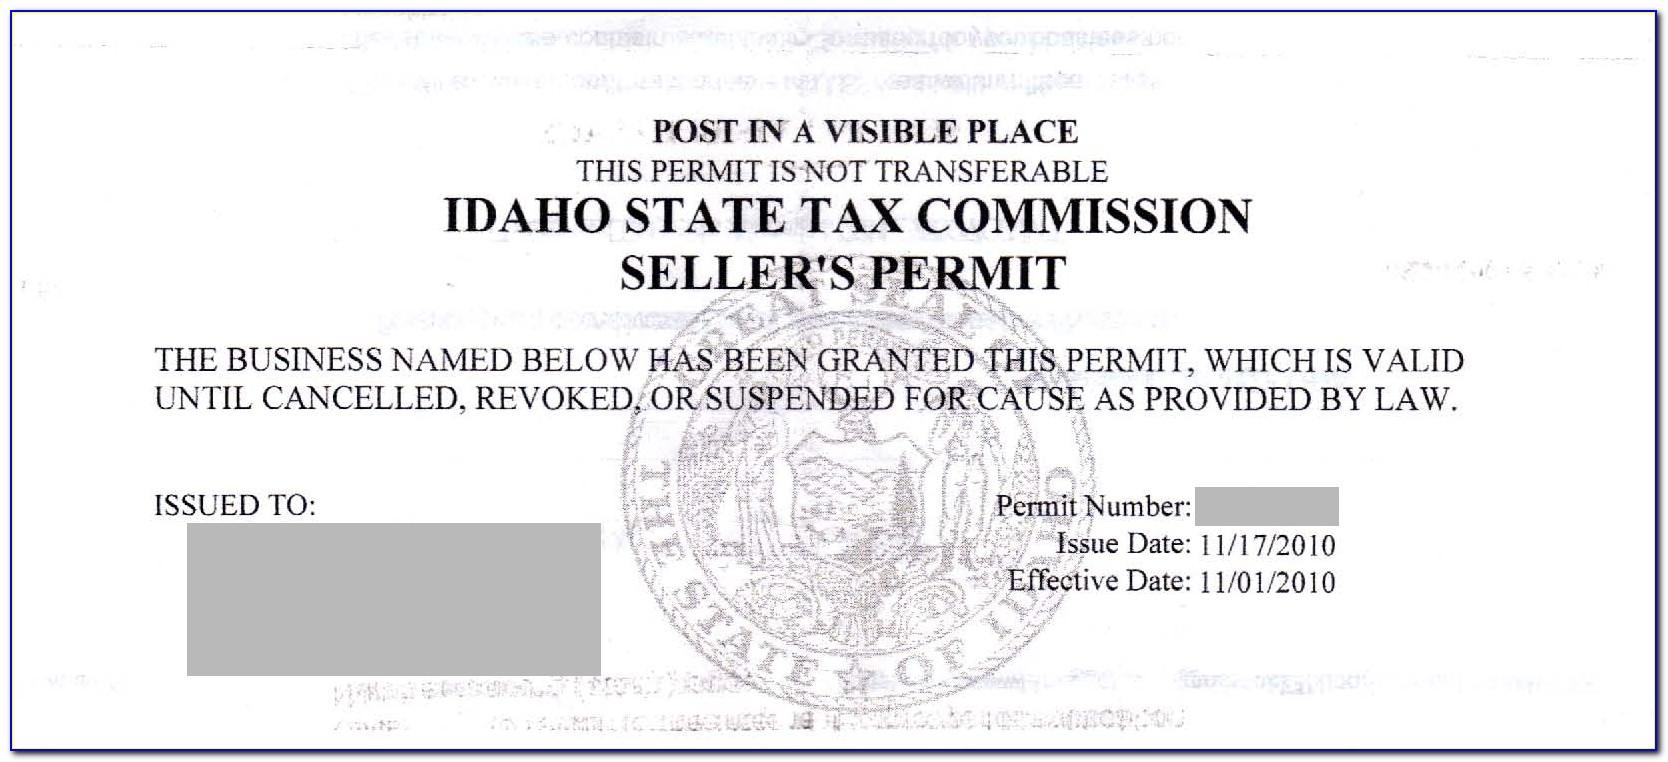 Georgia Resale Certificate St 5